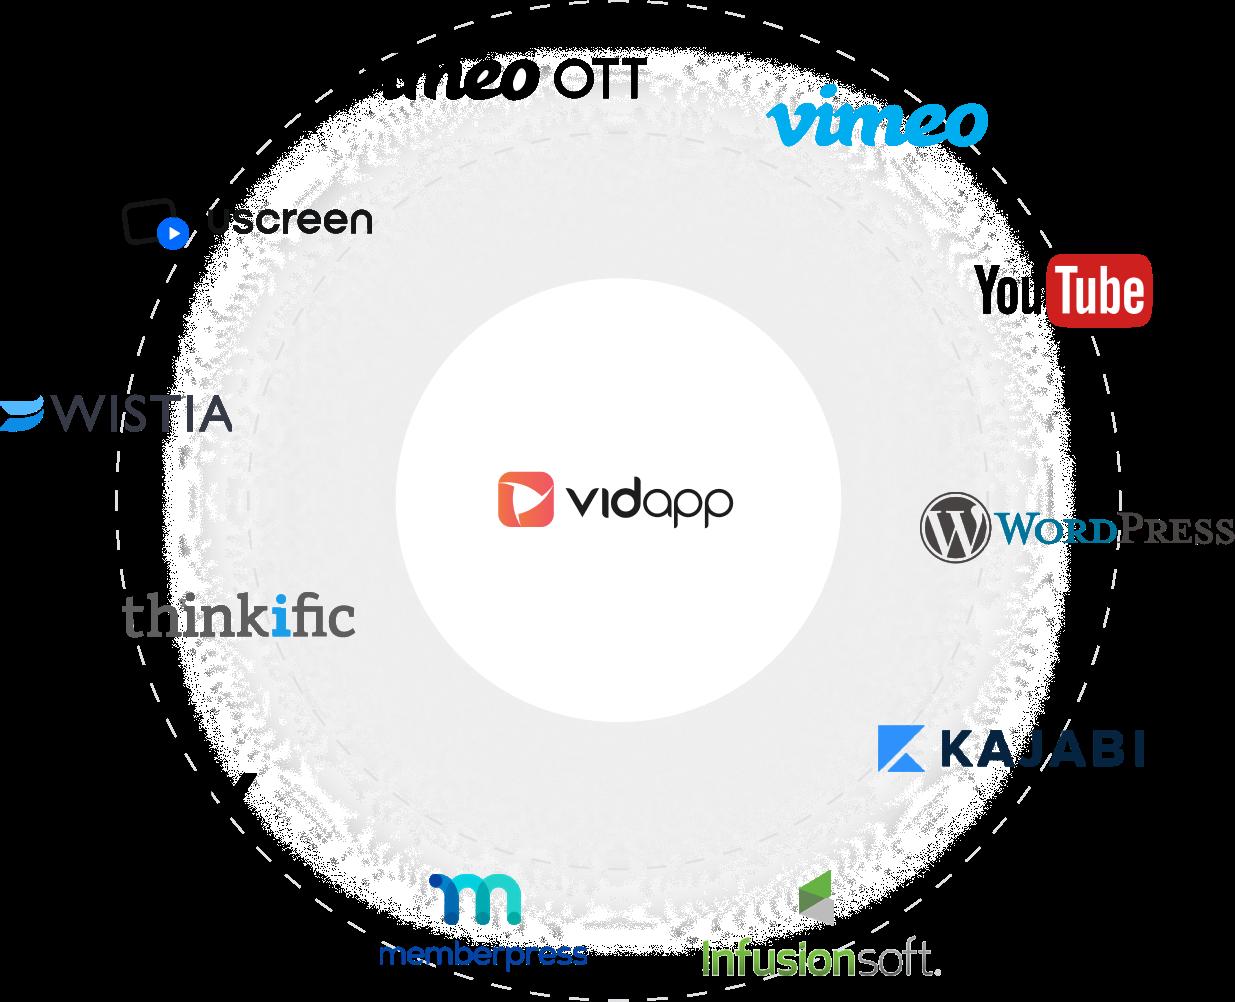 App integration with OTT platfoms uscreen, kajabi, wordpress,vimeo ott